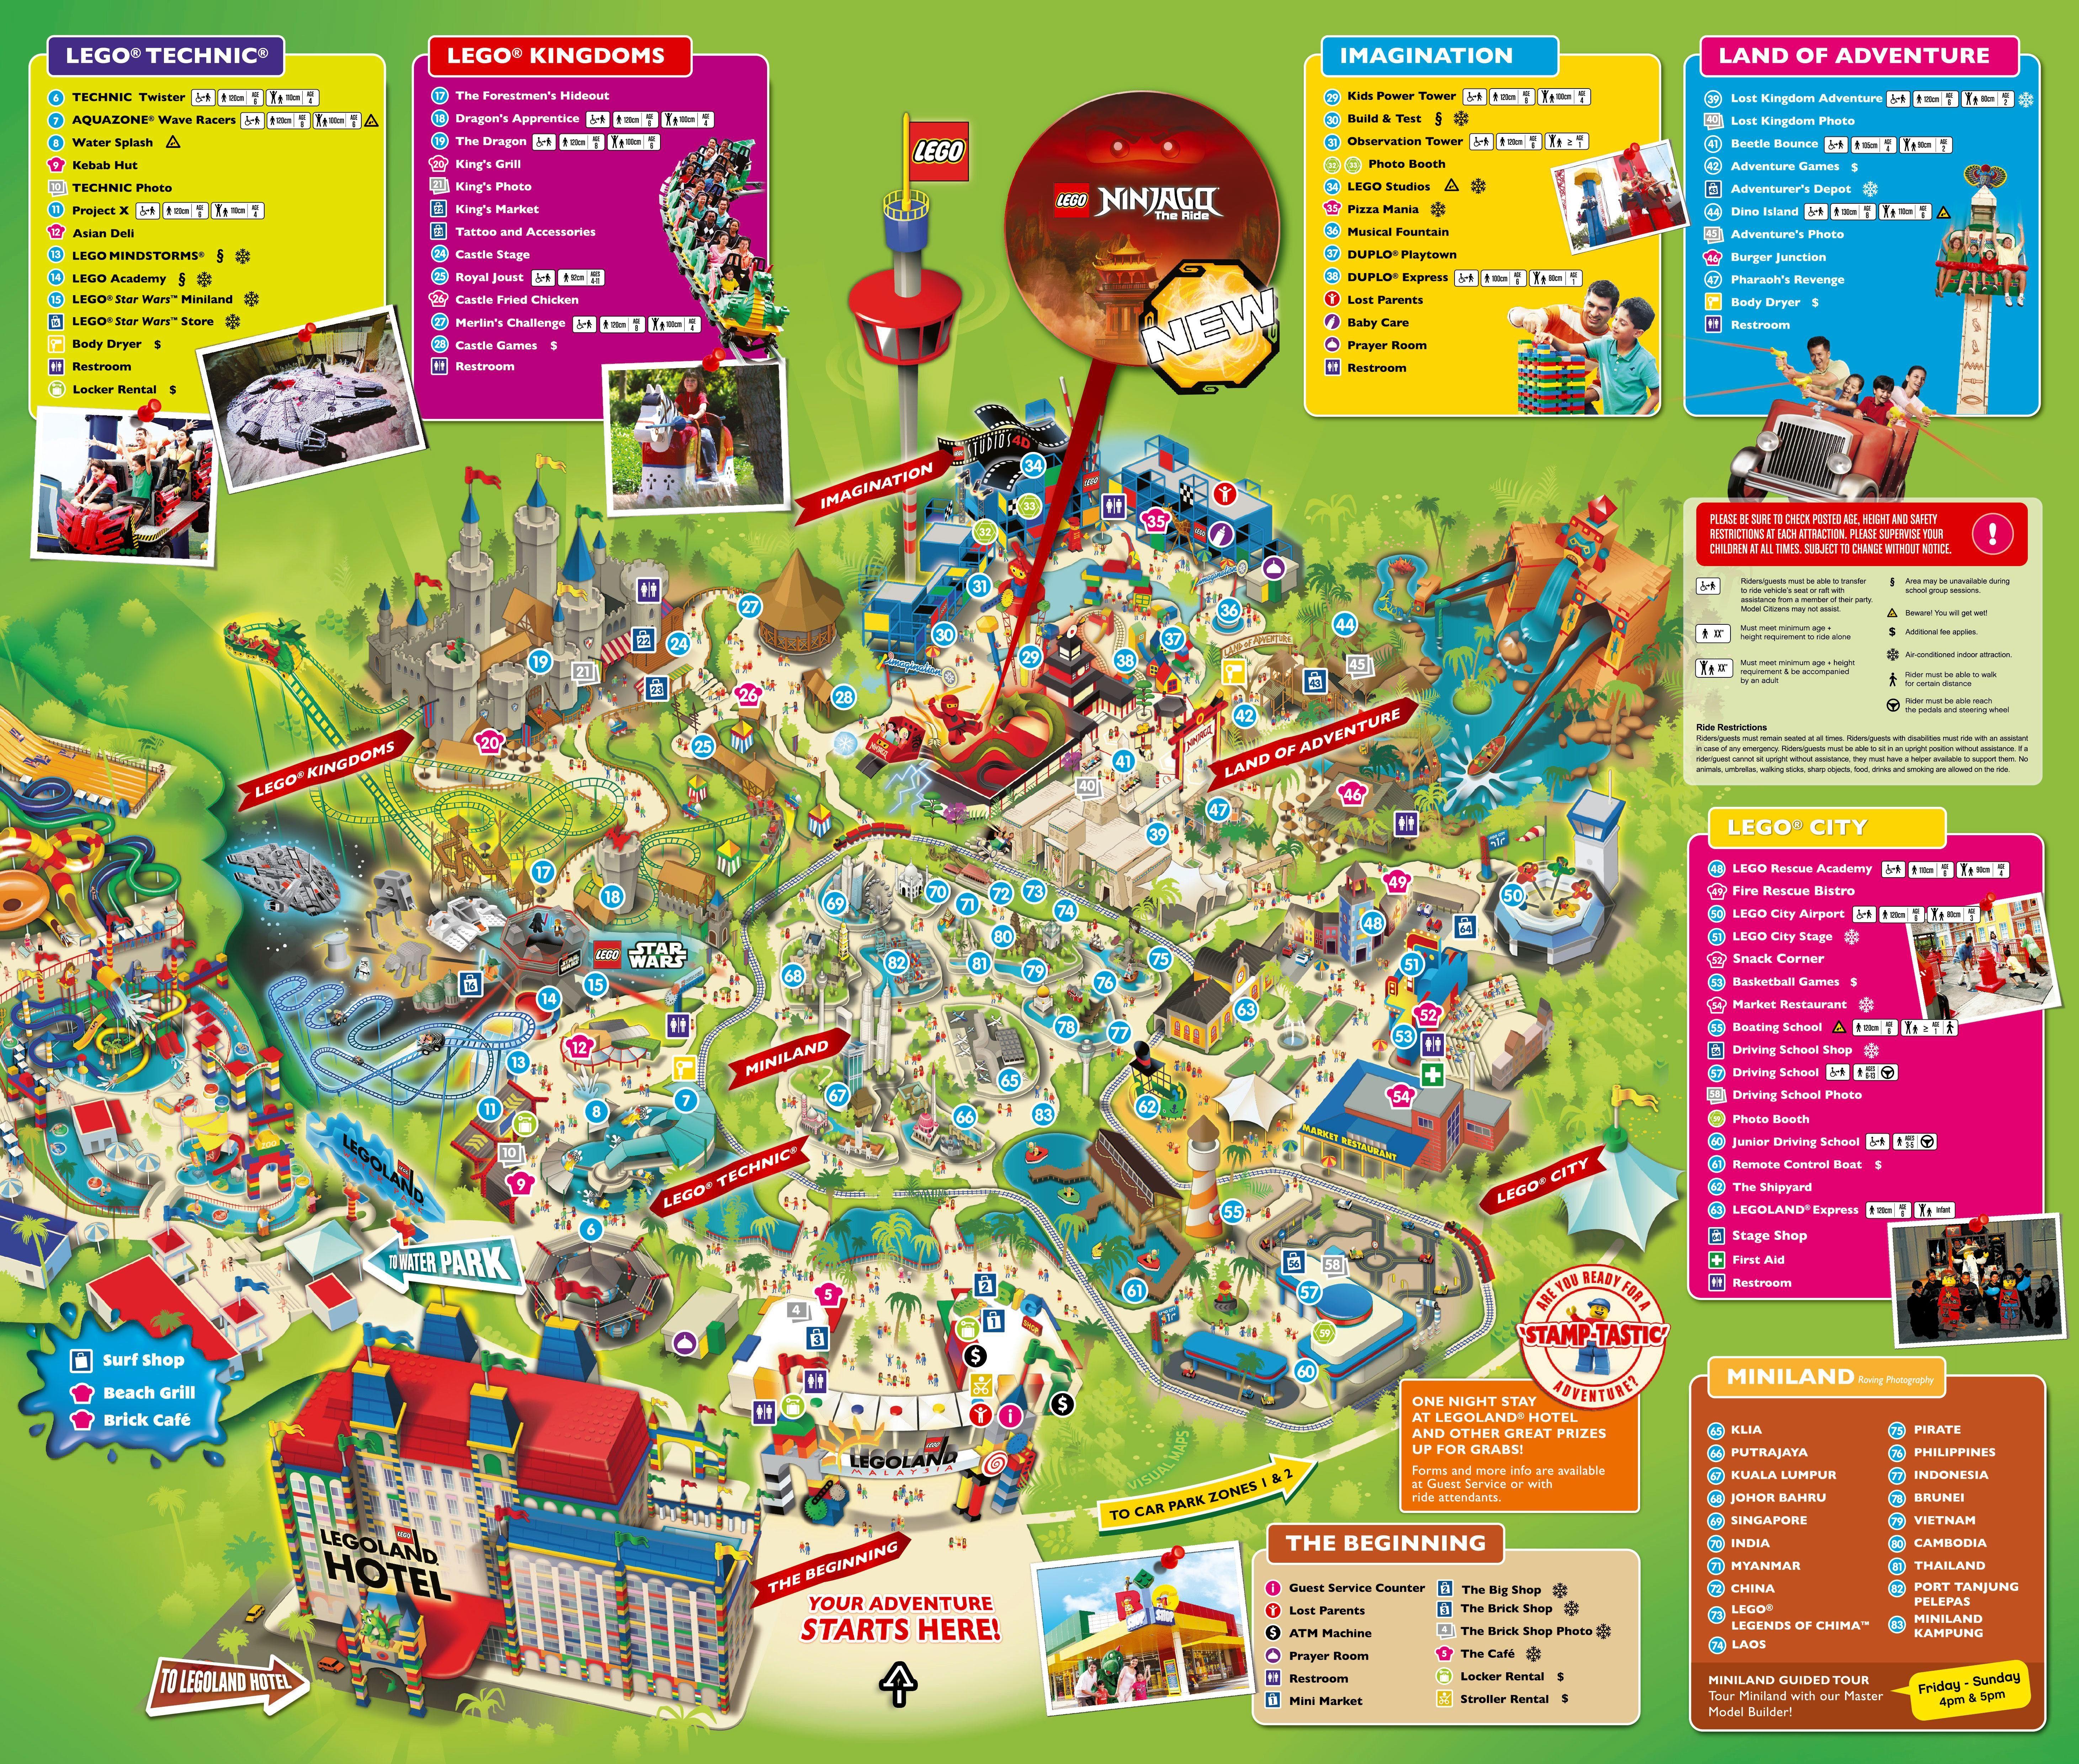 Legoland Malaysia Map 2017 | Legoland malaysia, Legoland ...